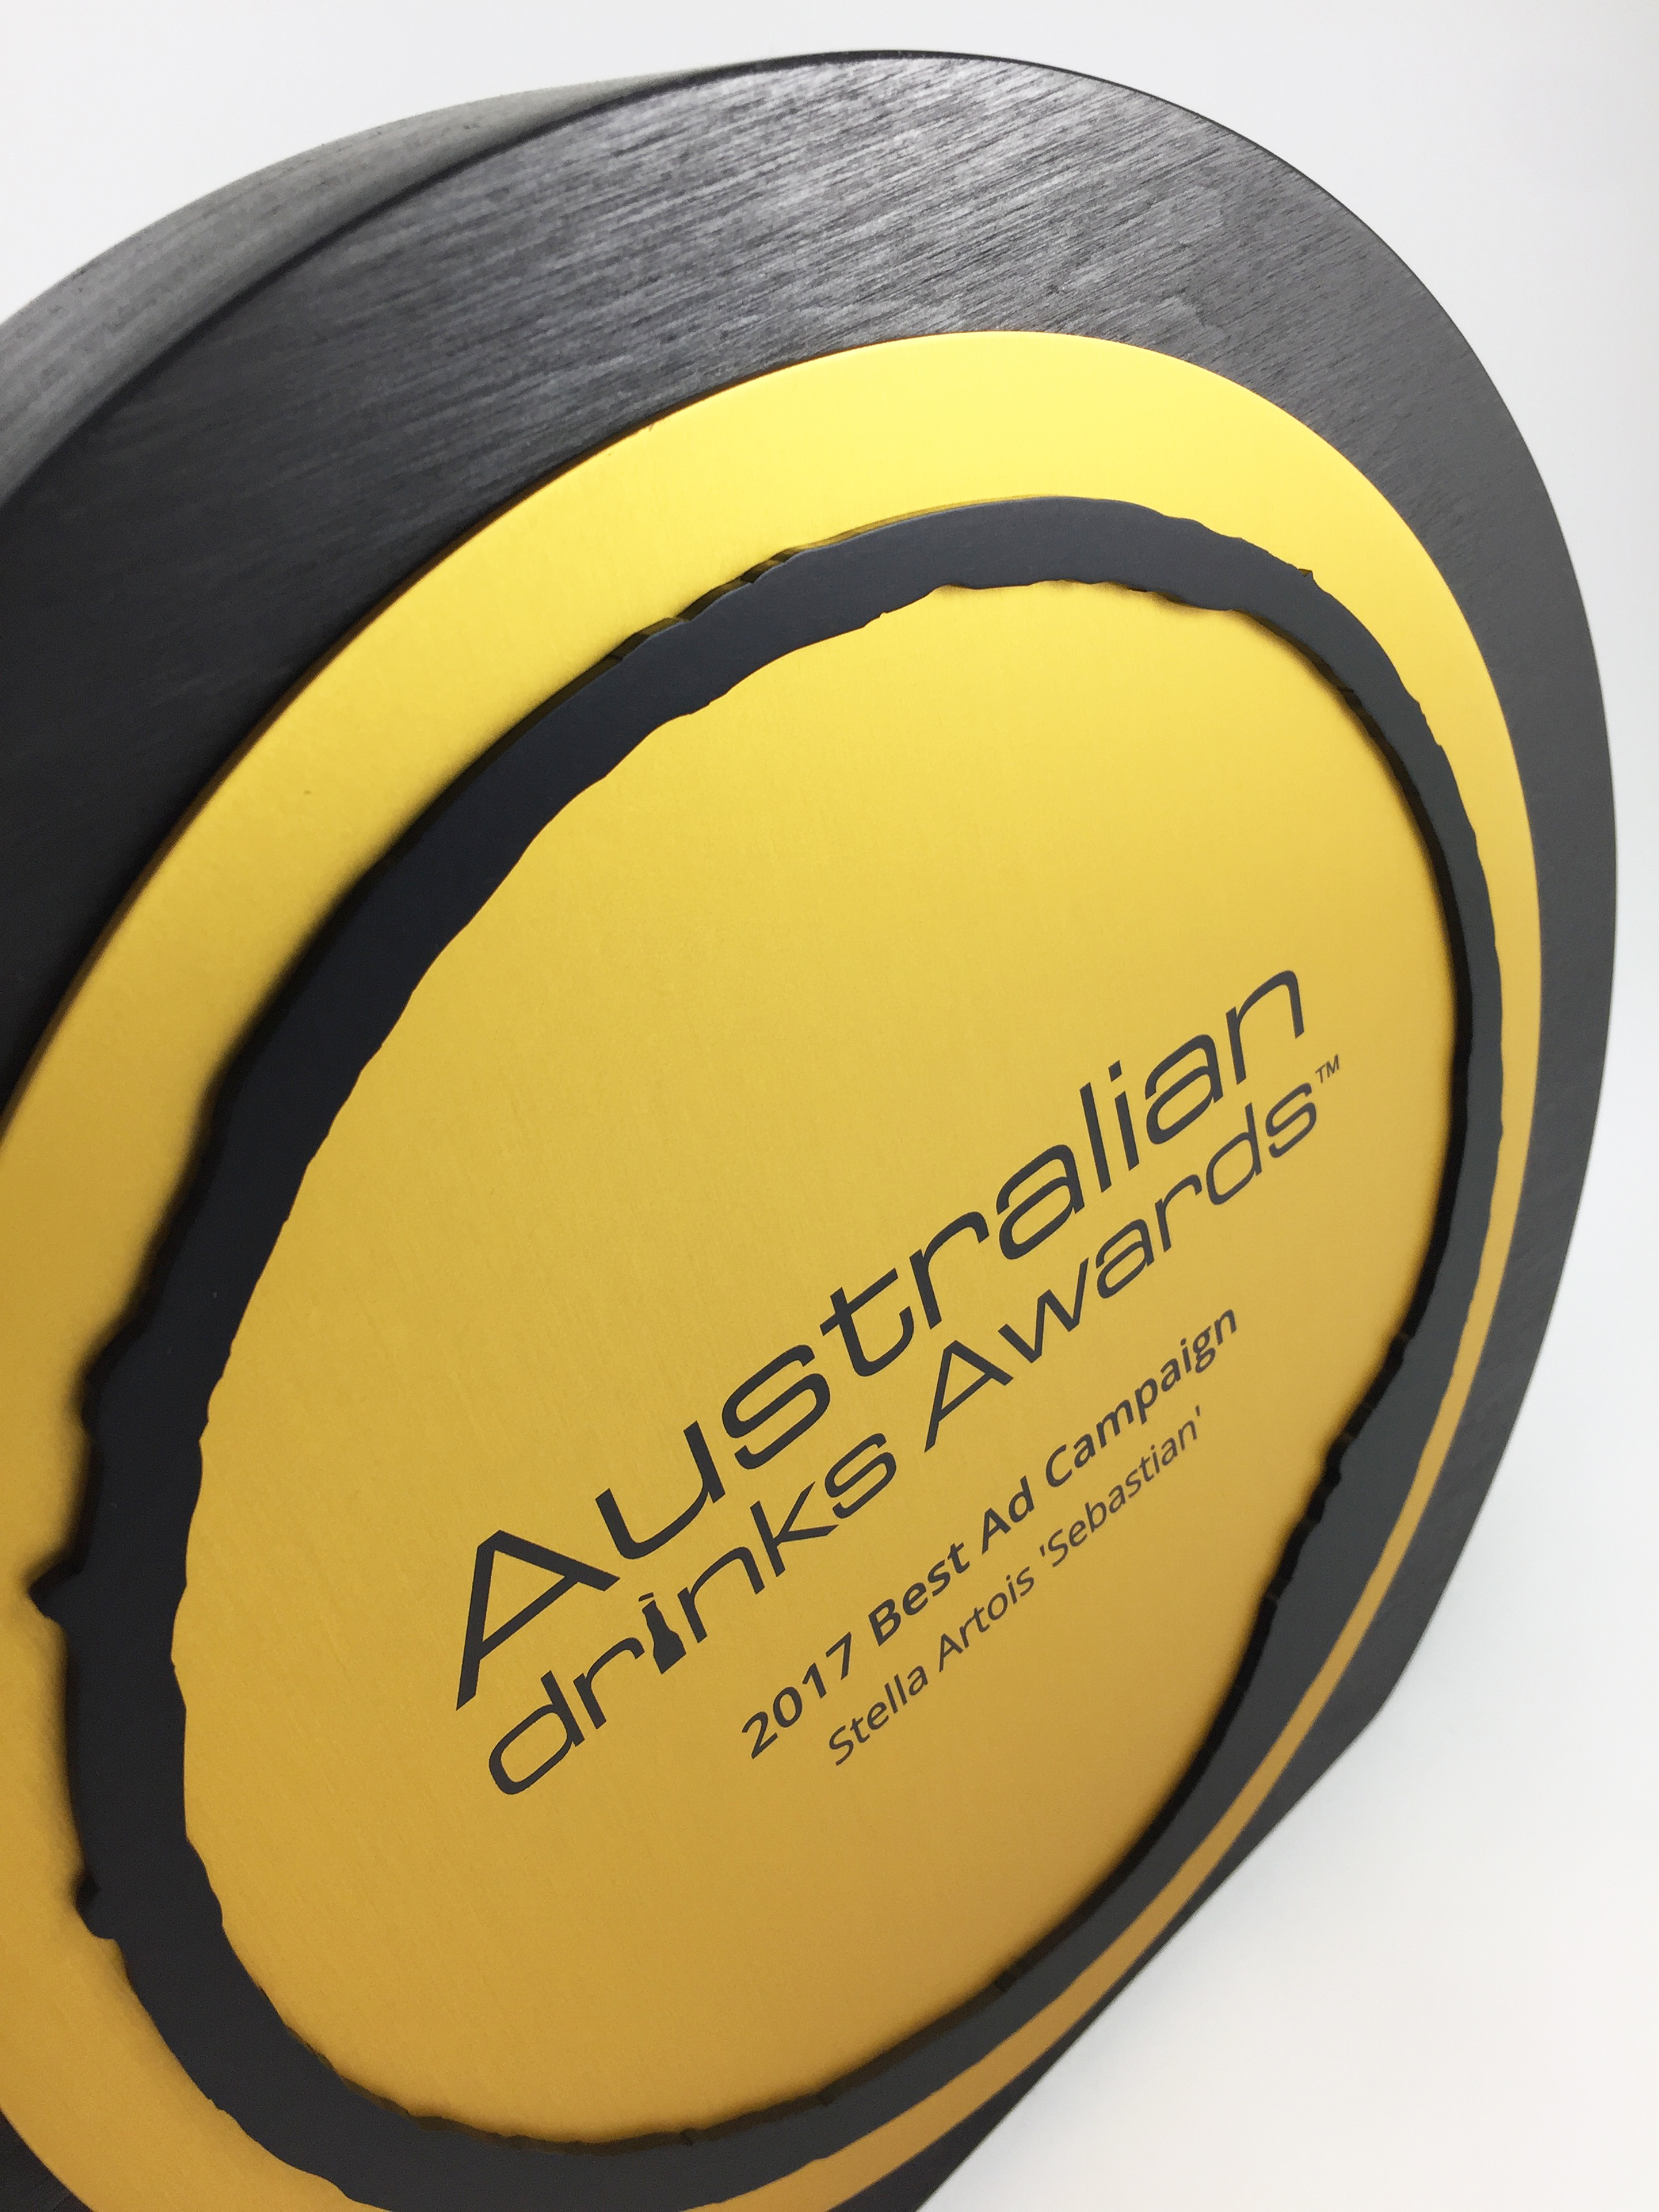 australian-drinks-awards-eco-timber-plywood-metal-trophy-03.jpg